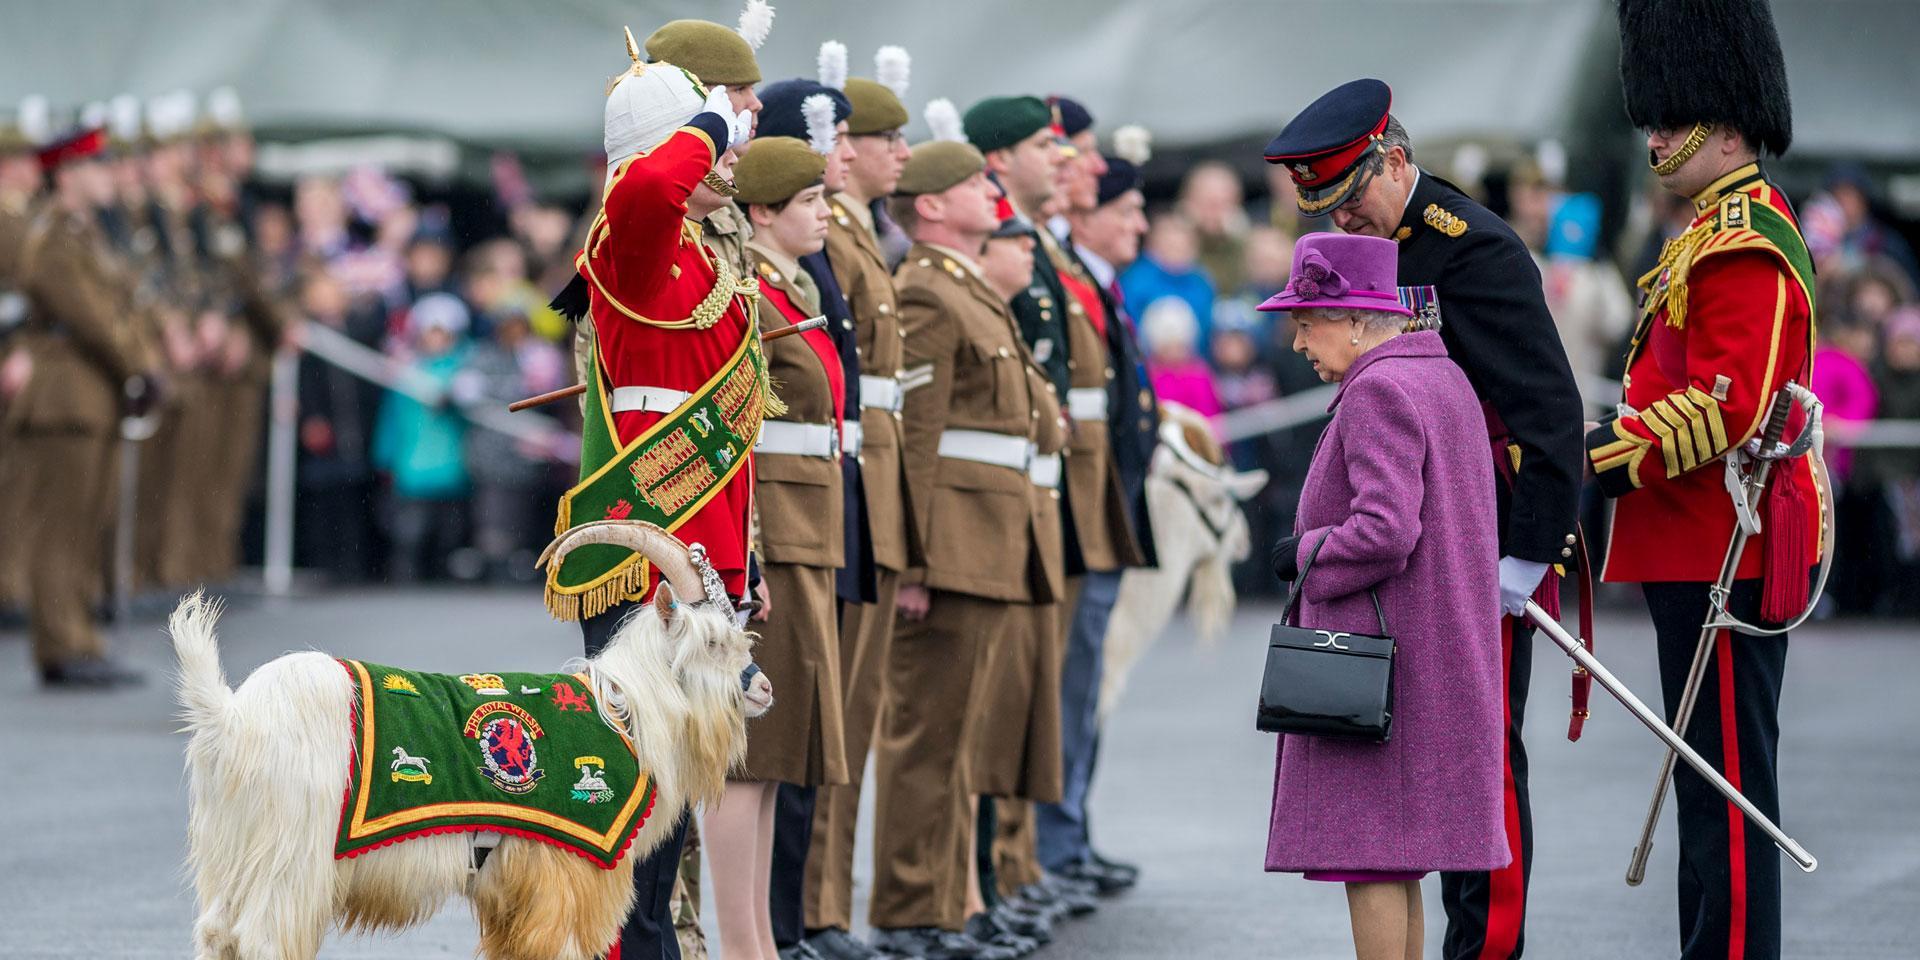 Queen Elizabeth II inspects Fusilier 'Llywelyn' of 1st Battalion The Royal Welsh Regiment, 2017